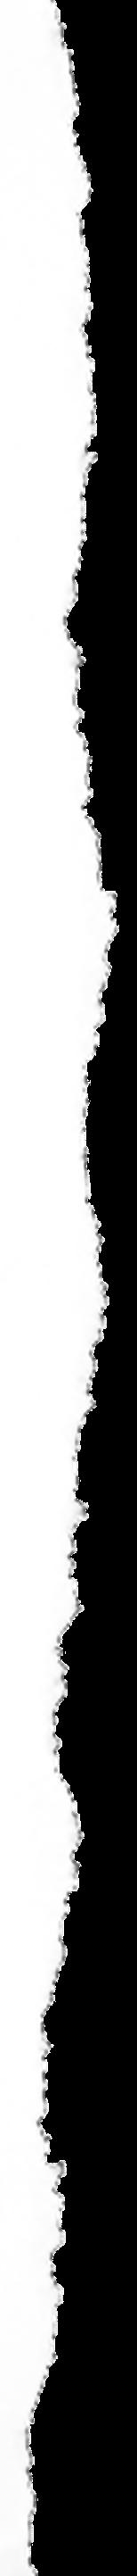 tornPAPER01_edited_edited_edited.png